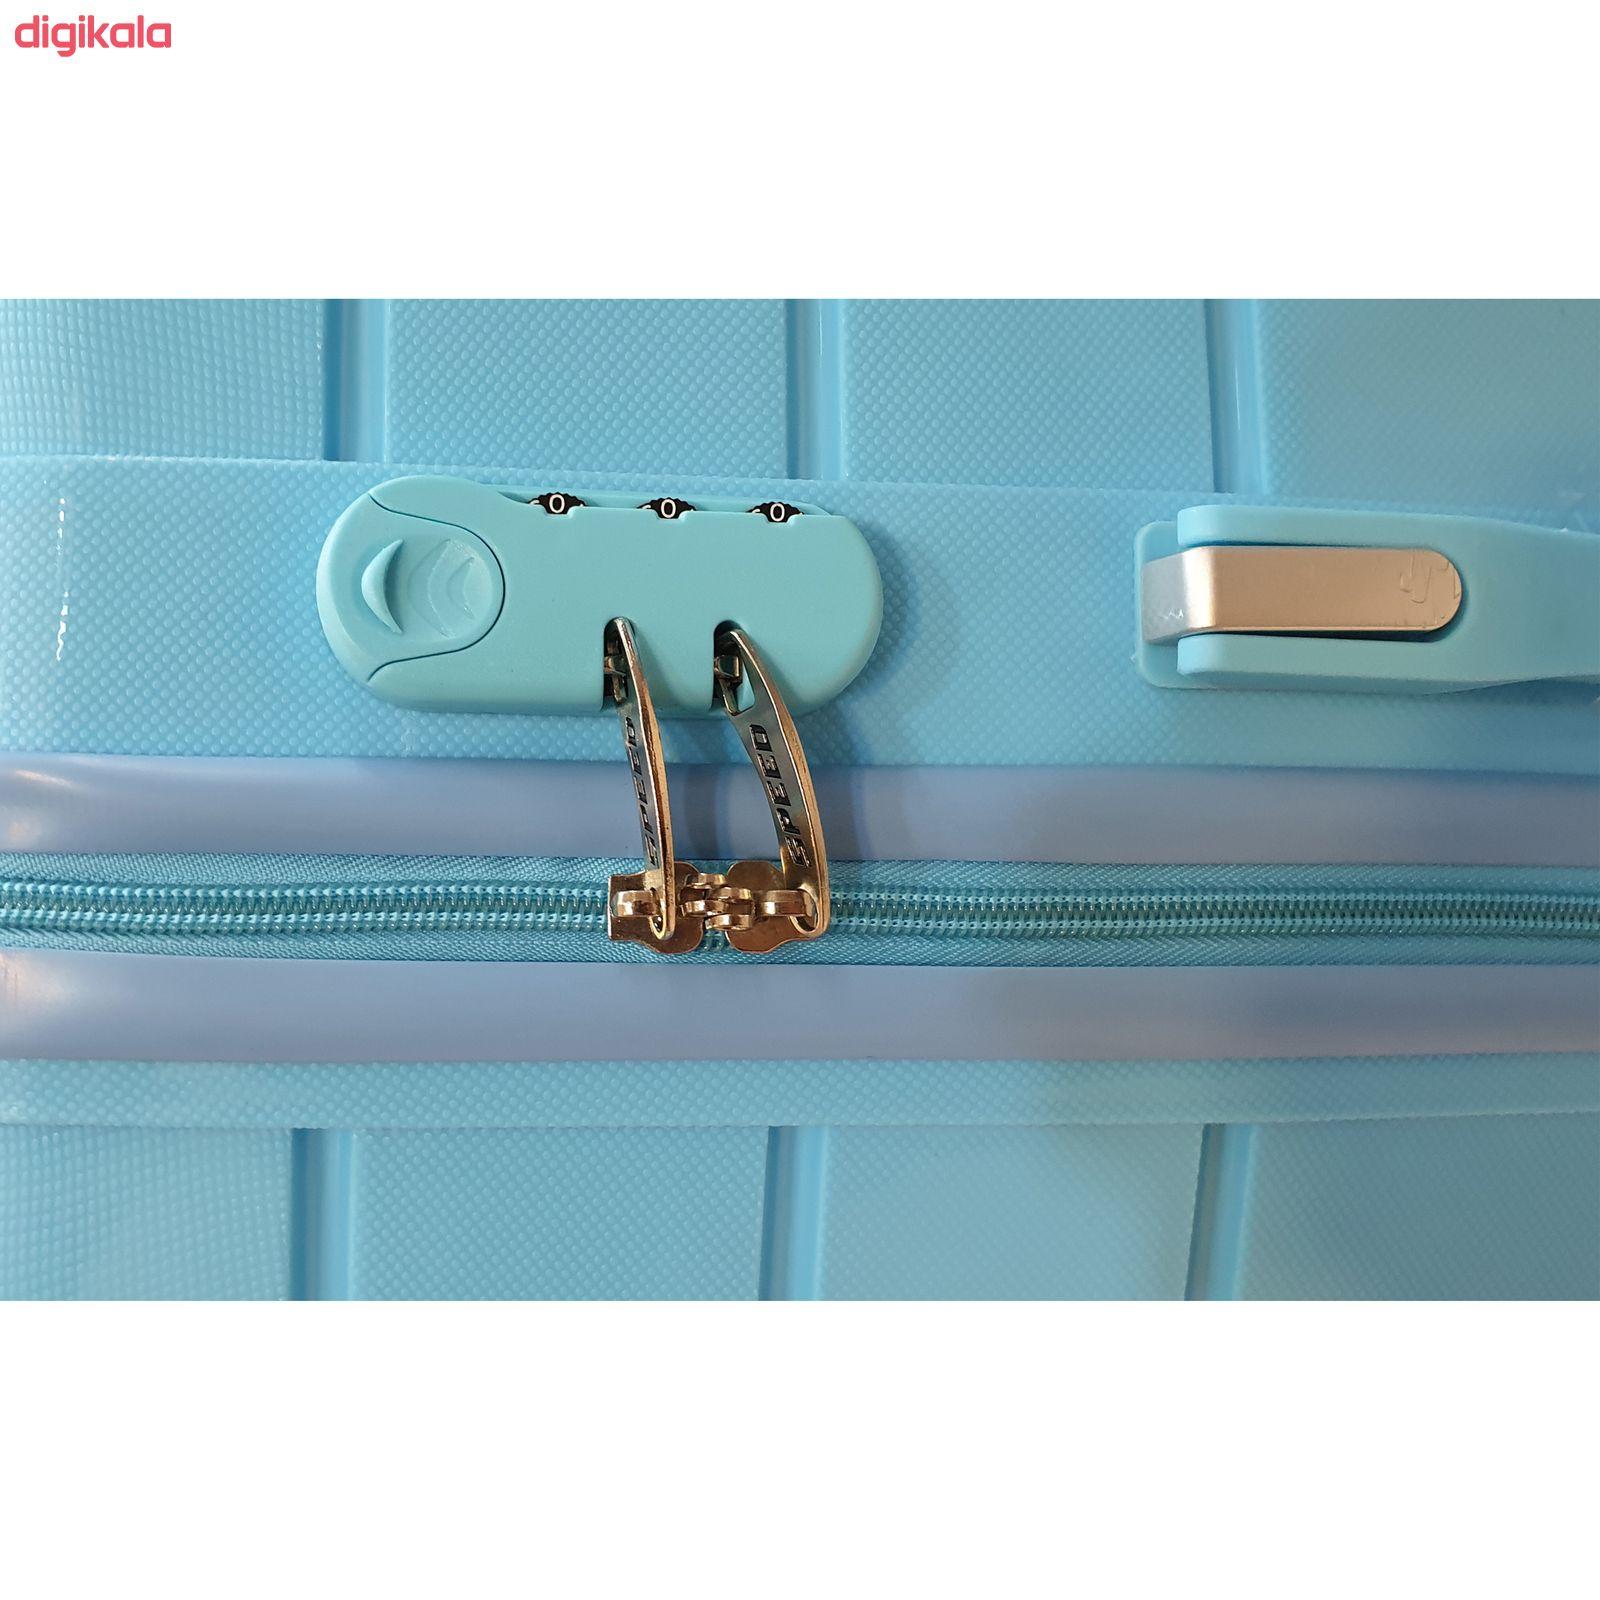 مجموعه سه عددی چمدان اسپید کد B016 main 1 7